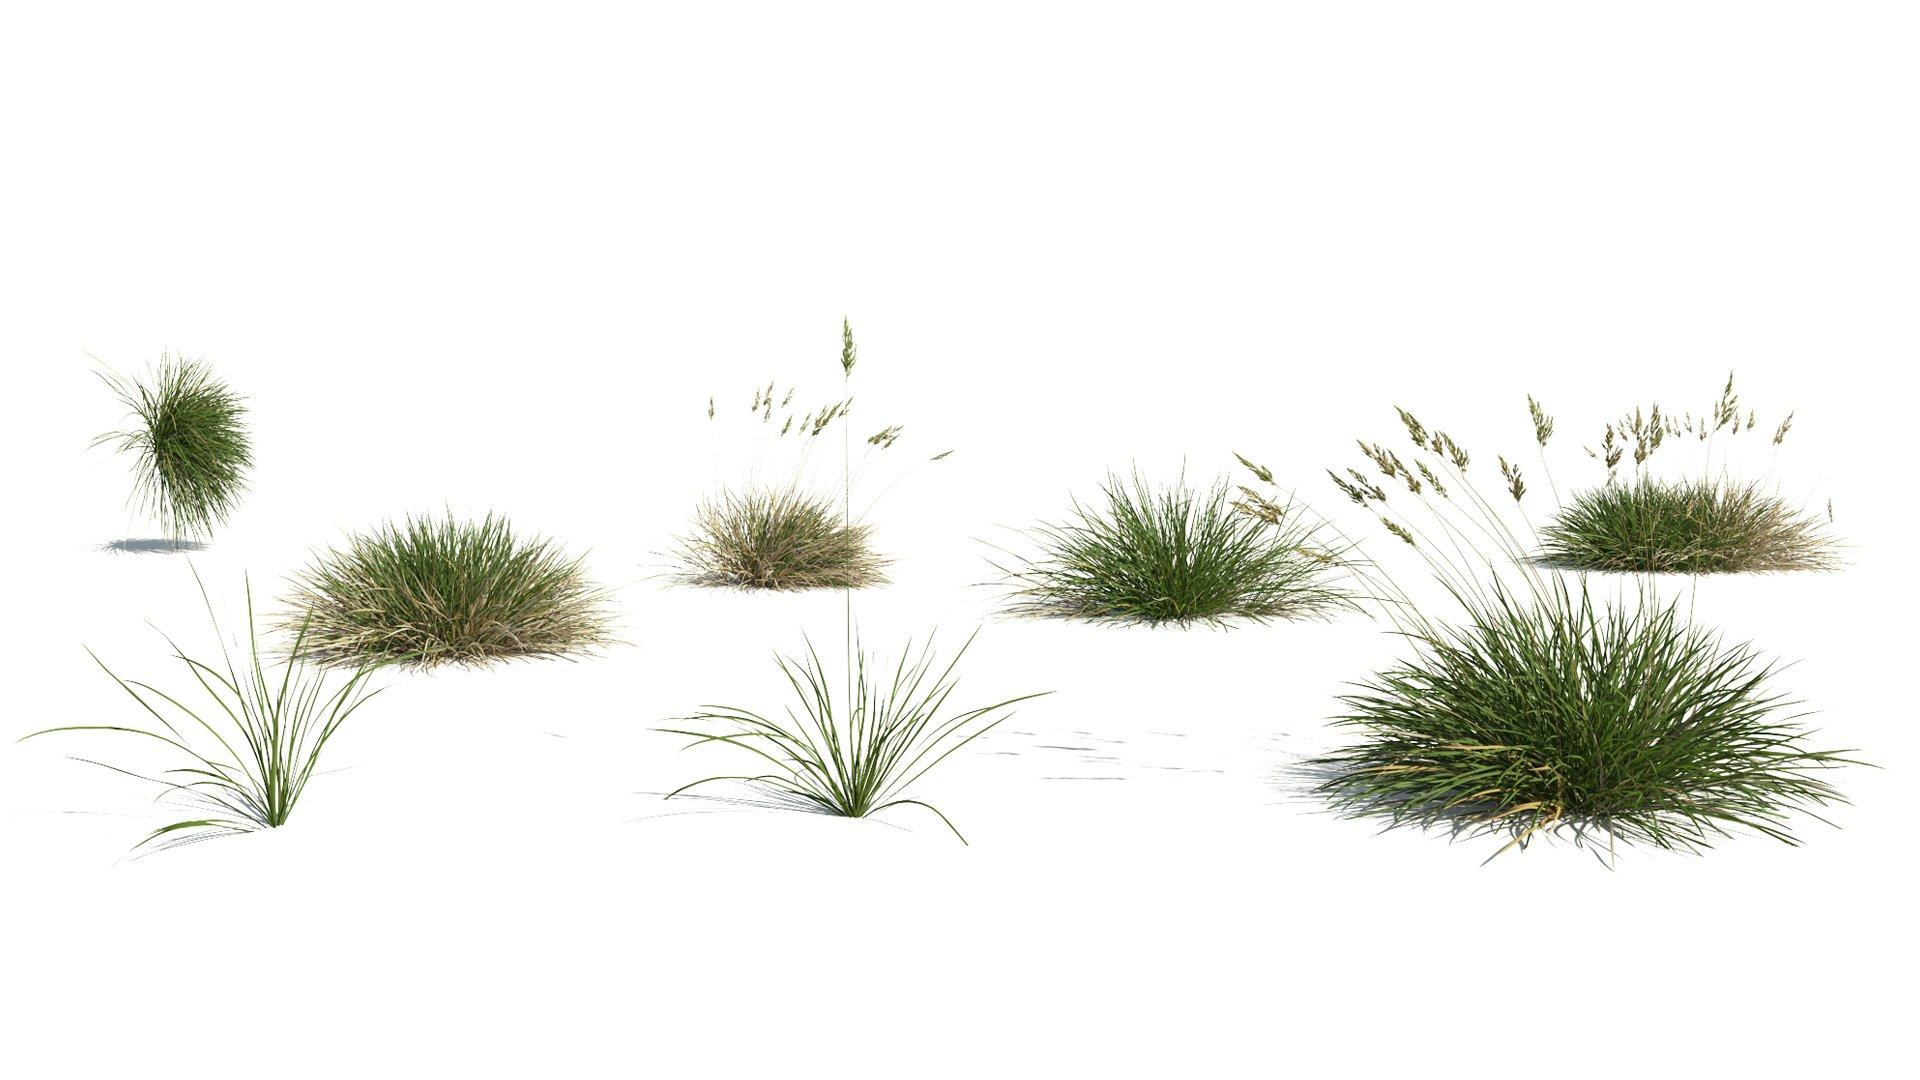 3D model of the Spiky fescue Festuca gautieri different presets